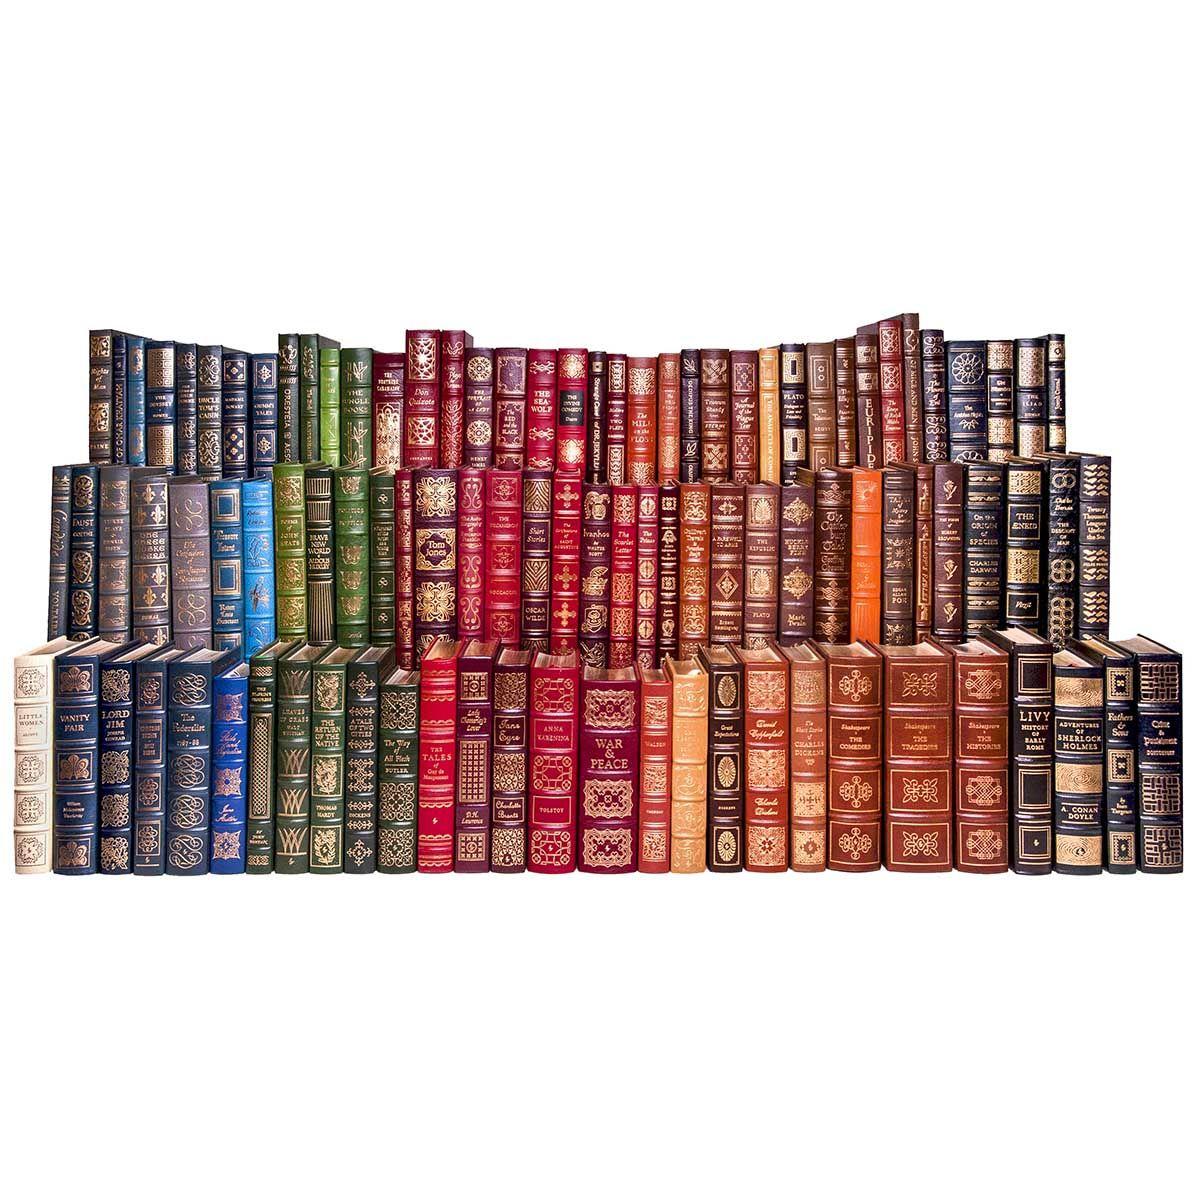 Easton press 100 greatest books set best books of all